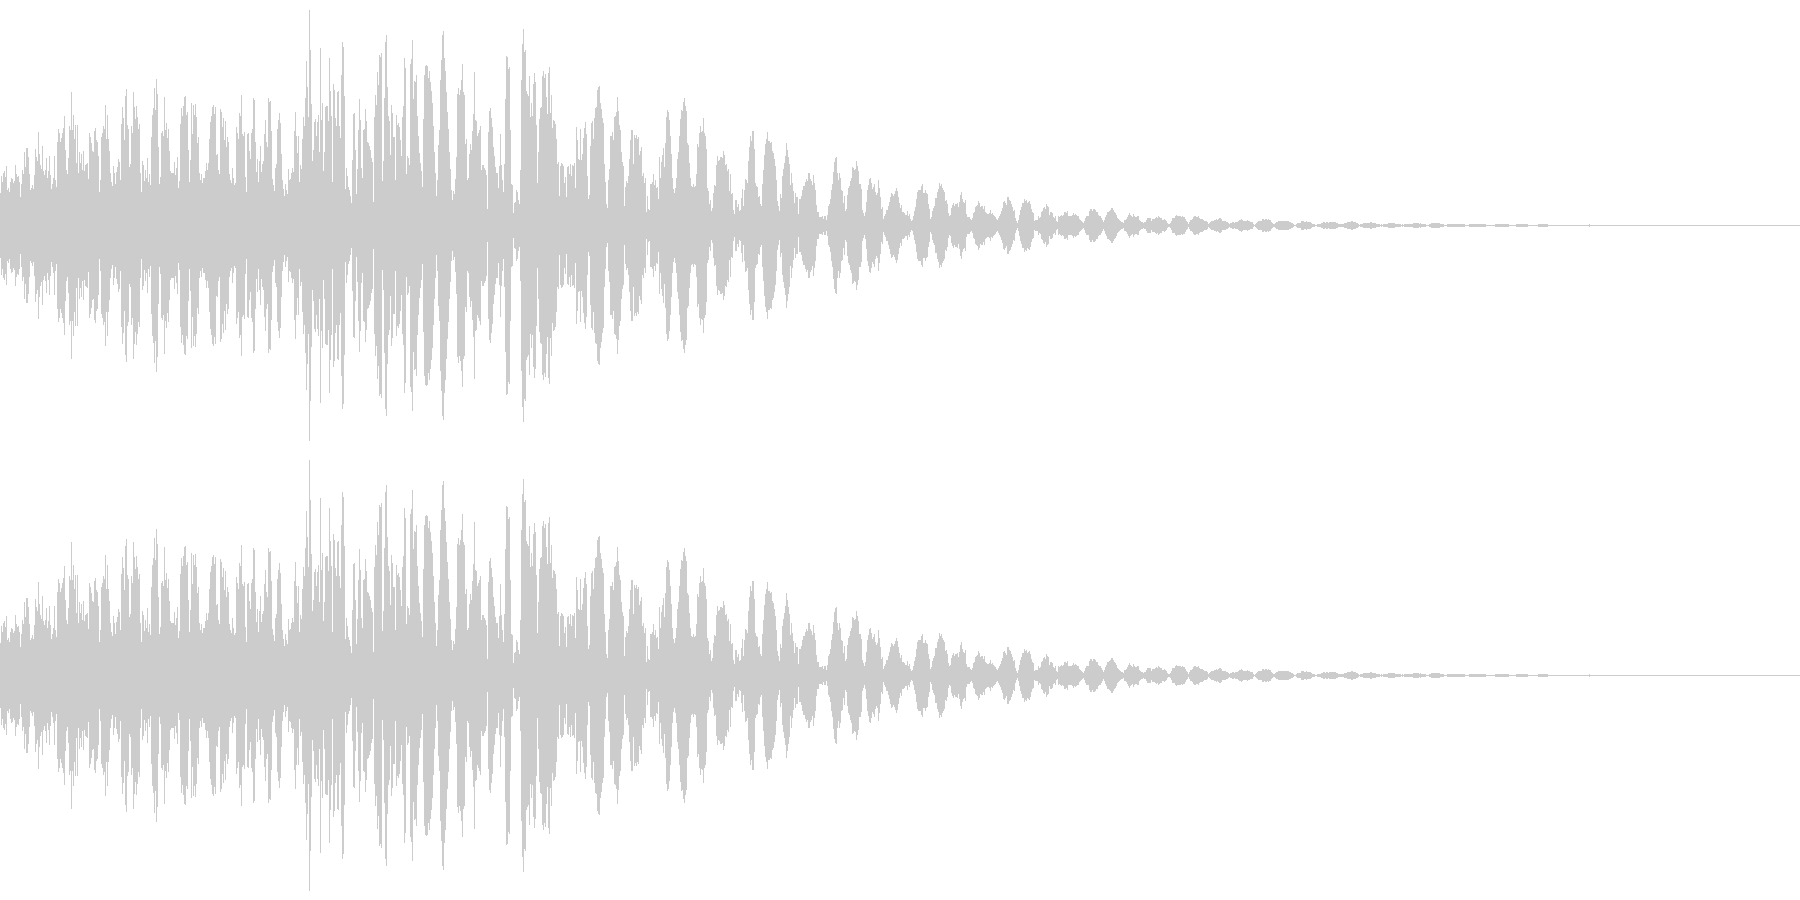 SFメカの挙動、足音などのイメージの未再生の波形